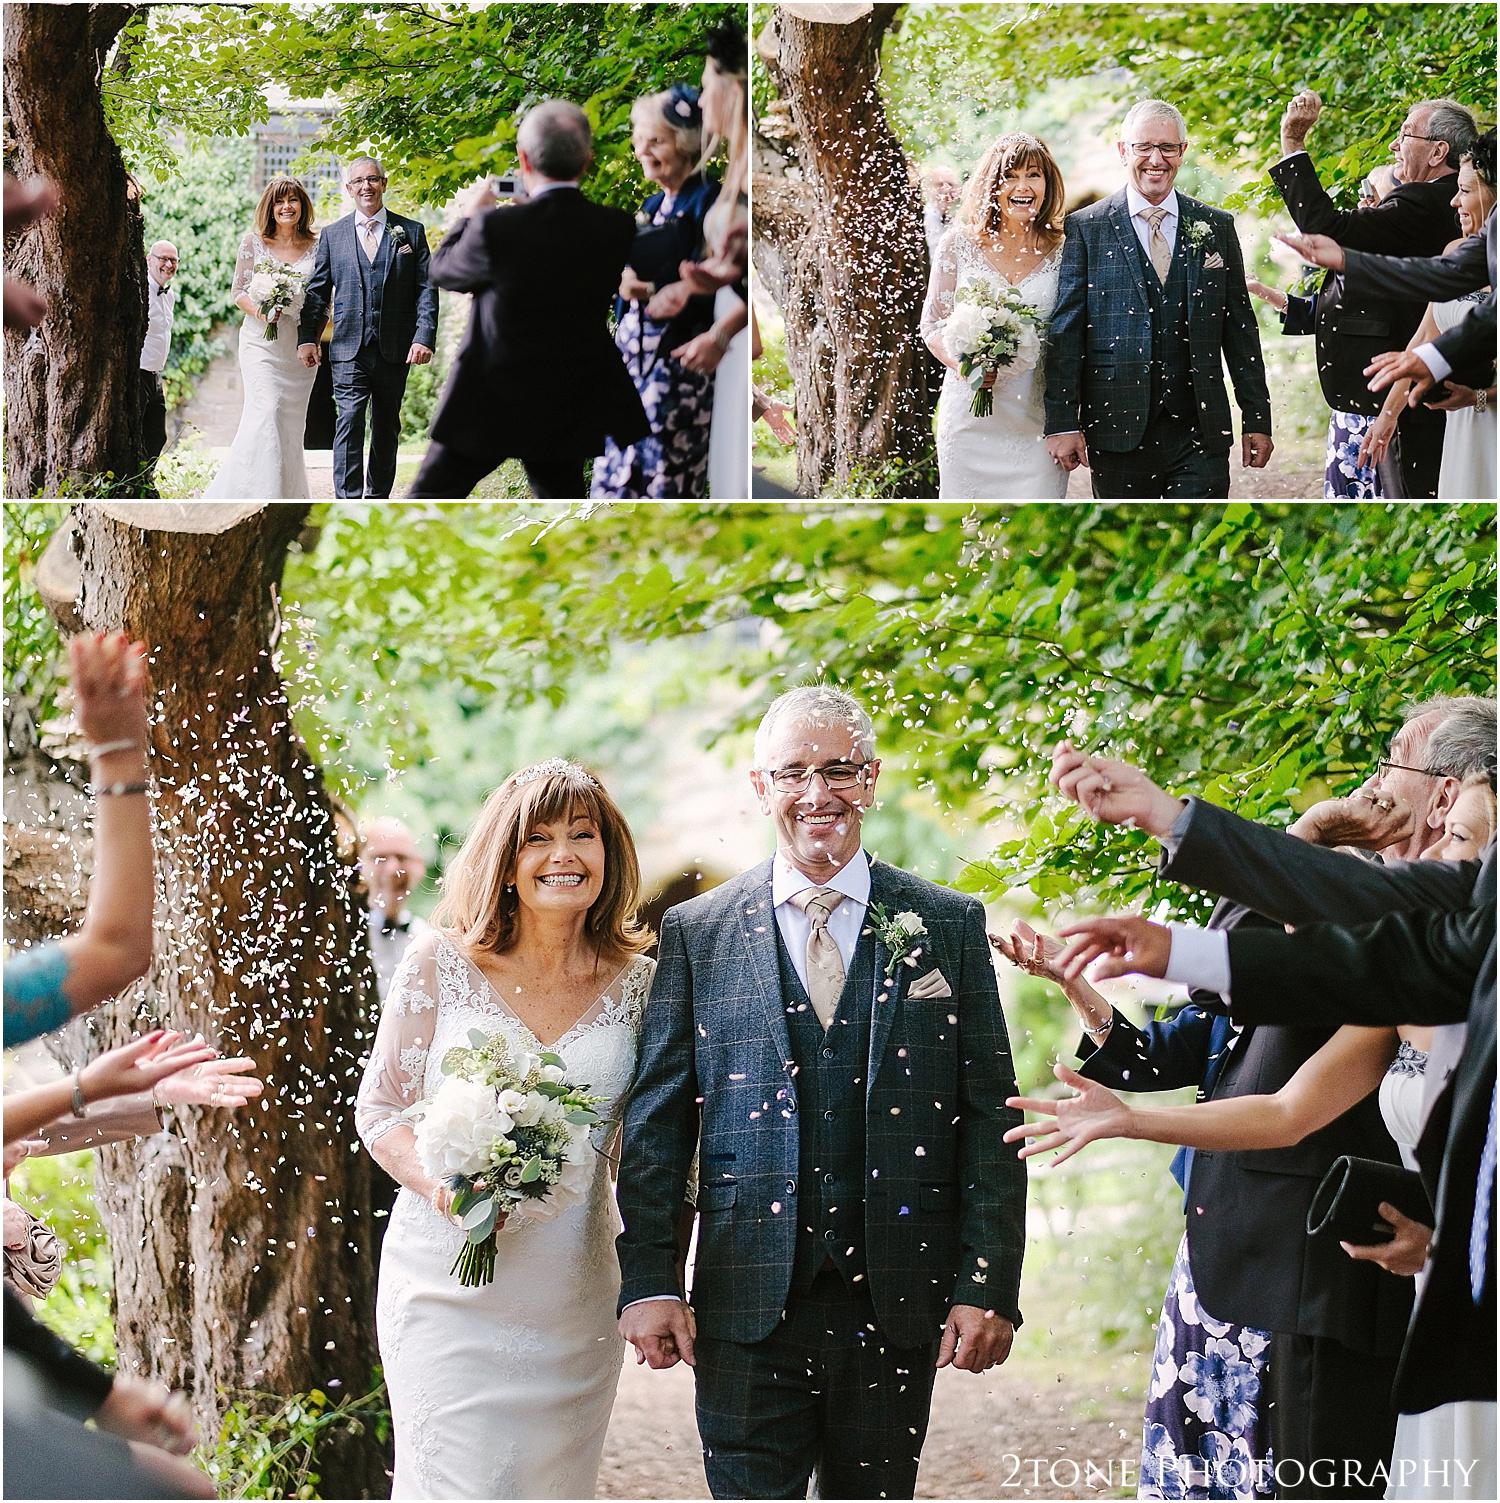 Crook Hall wedding photographer 023.jpg